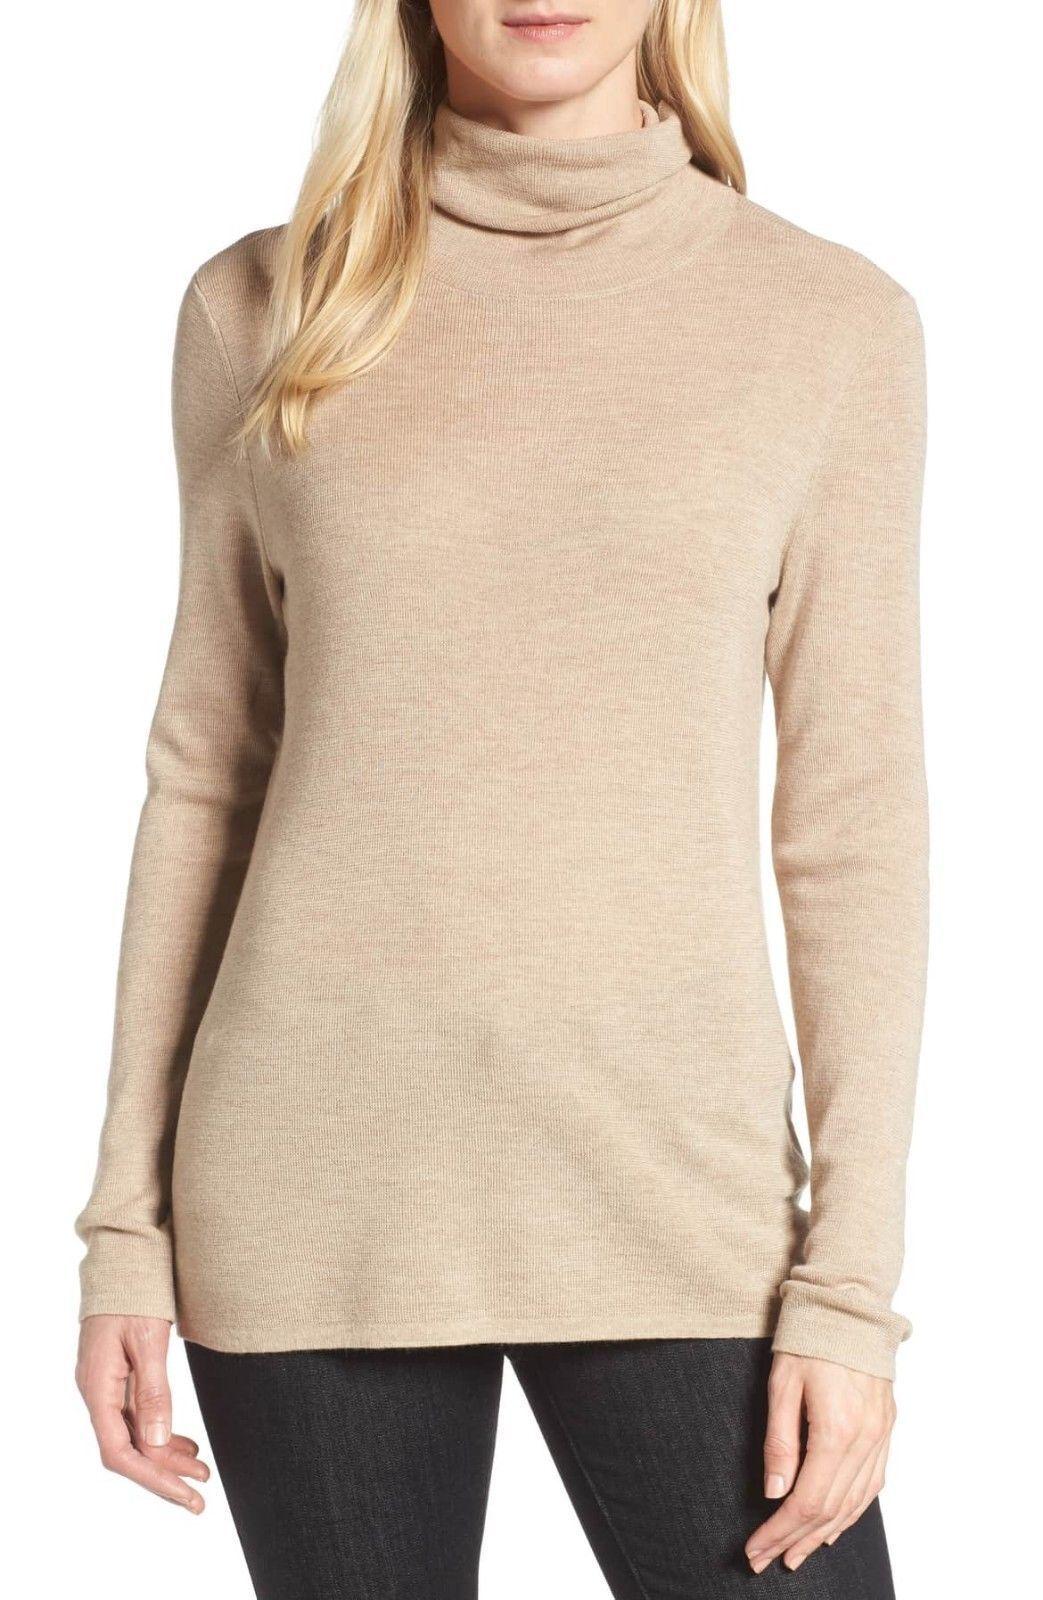 248 BNWT Eileen Fisher Italian Ultrafine Merino Rib MAPLE OAT  Sweater XL L M S